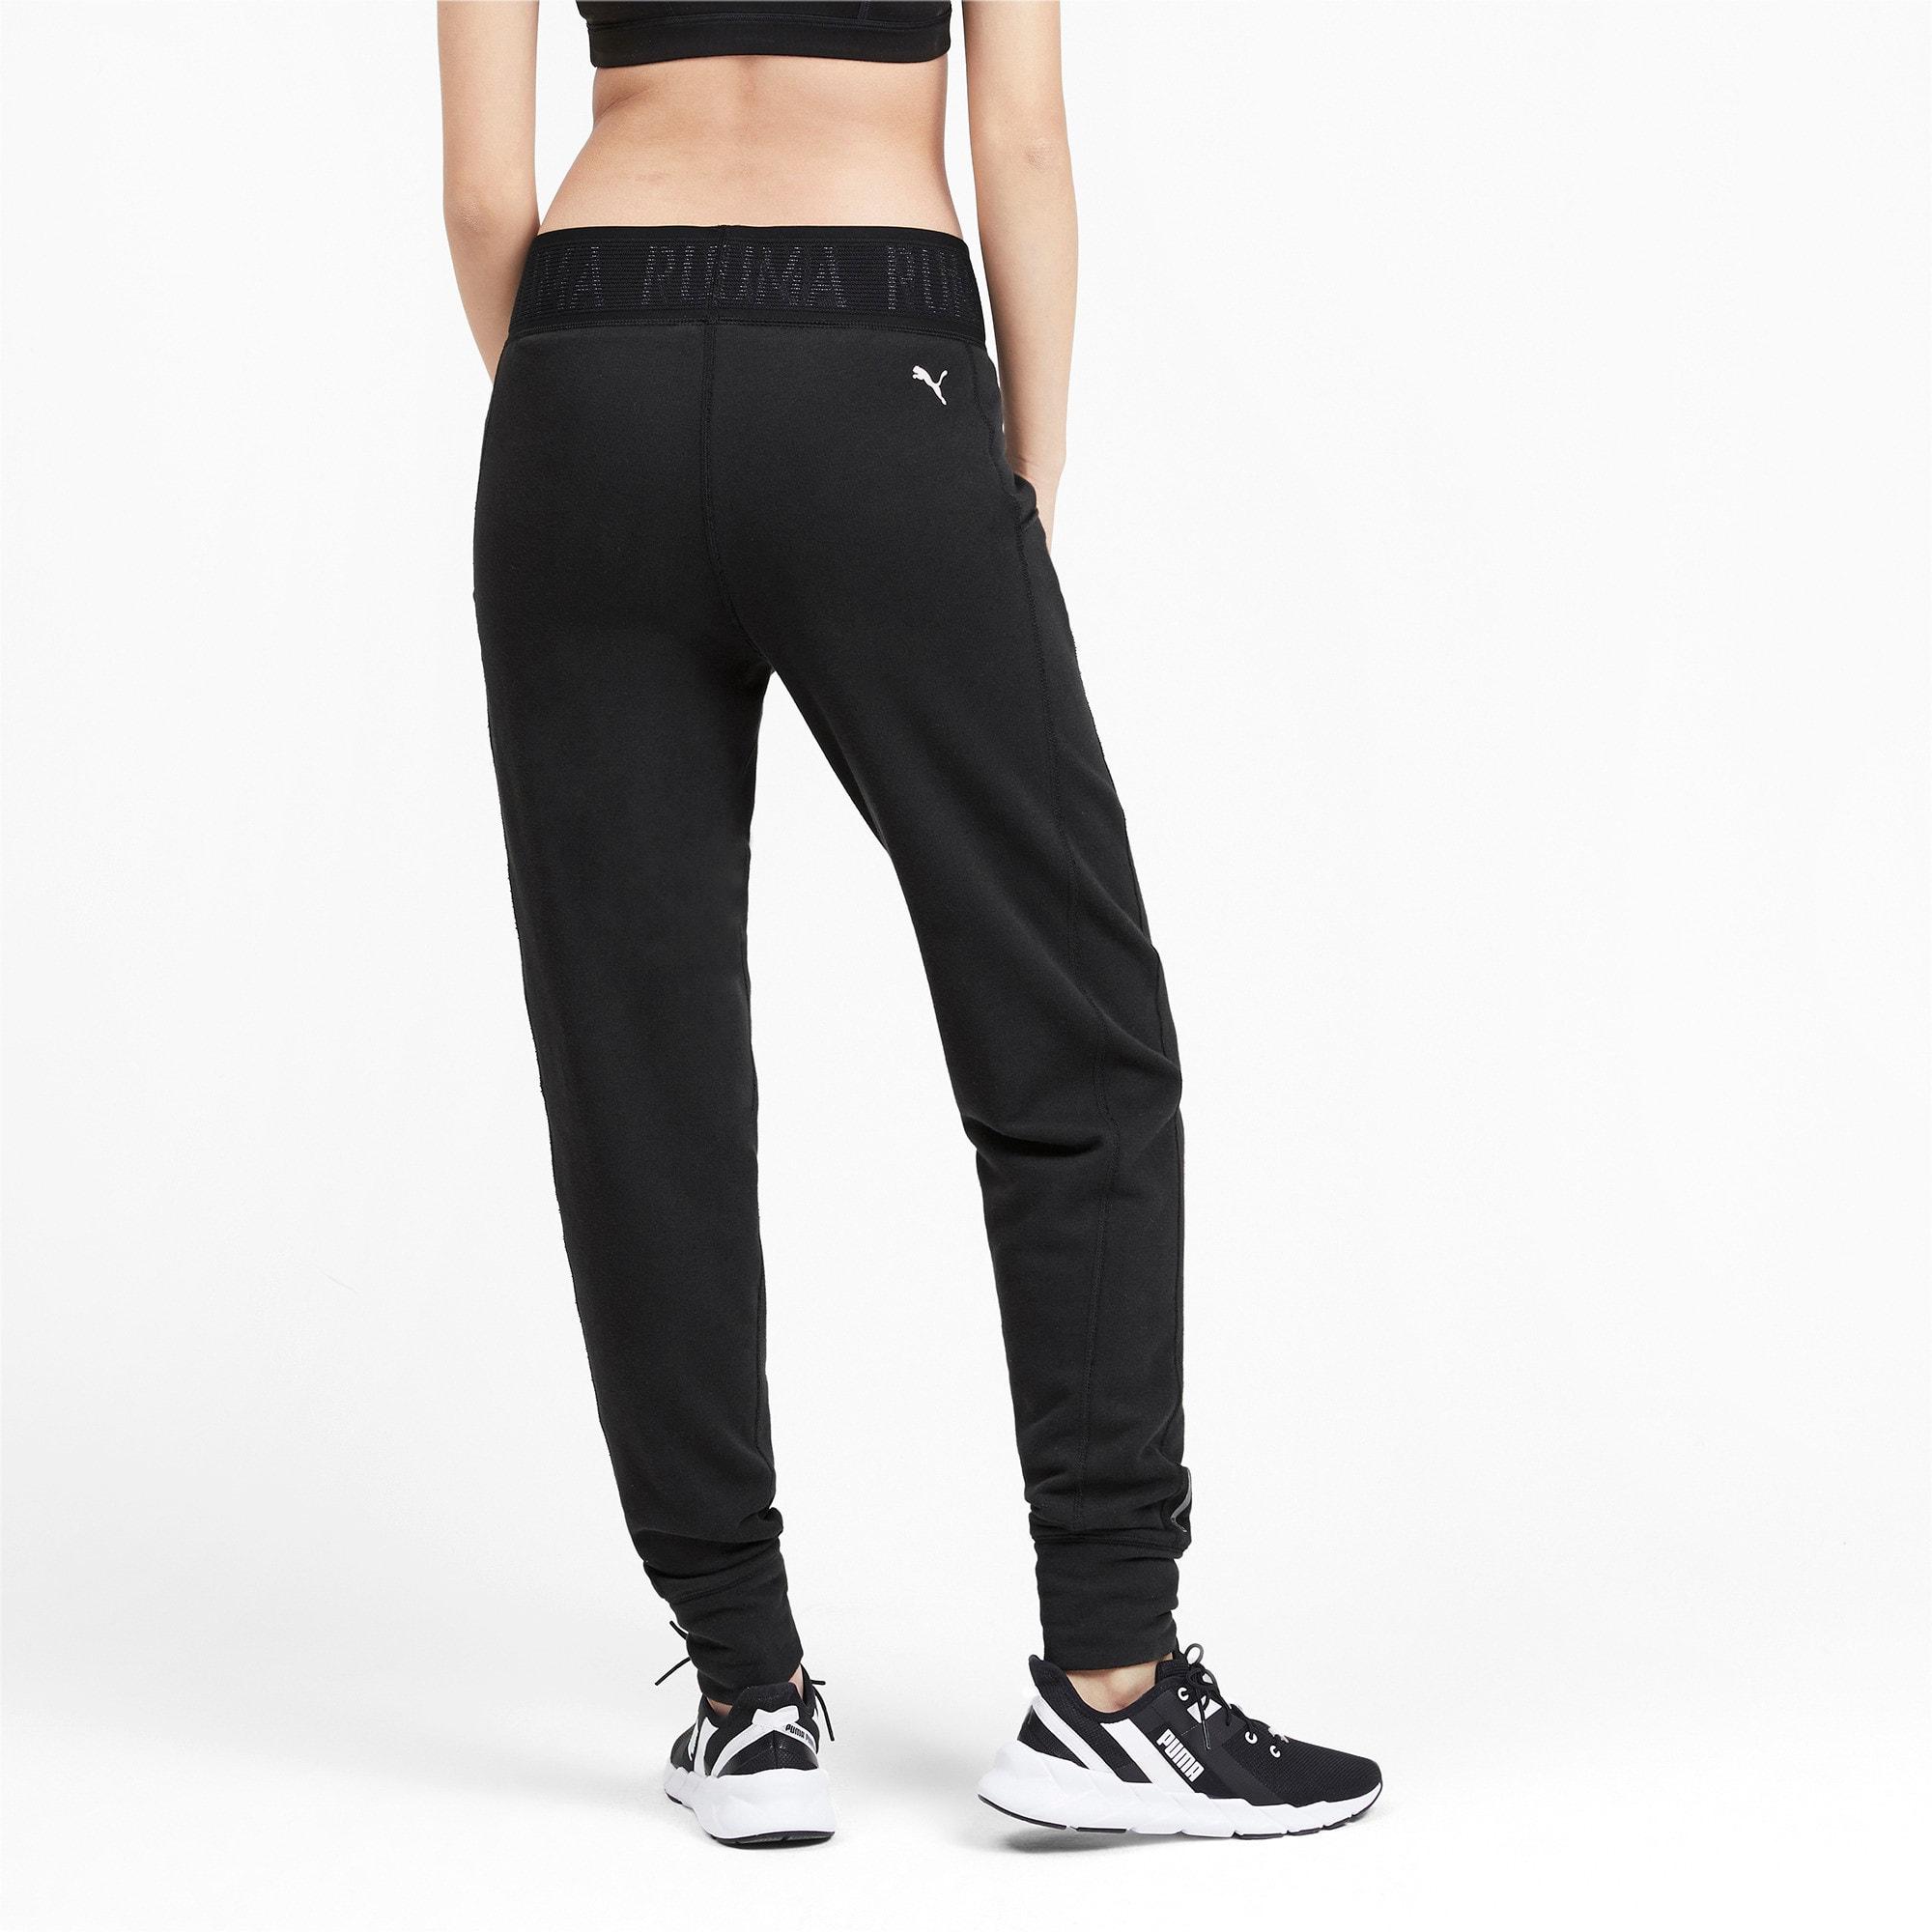 Thumbnail 2 of Logo Women's Sweatpants, Puma Black-Q3, medium